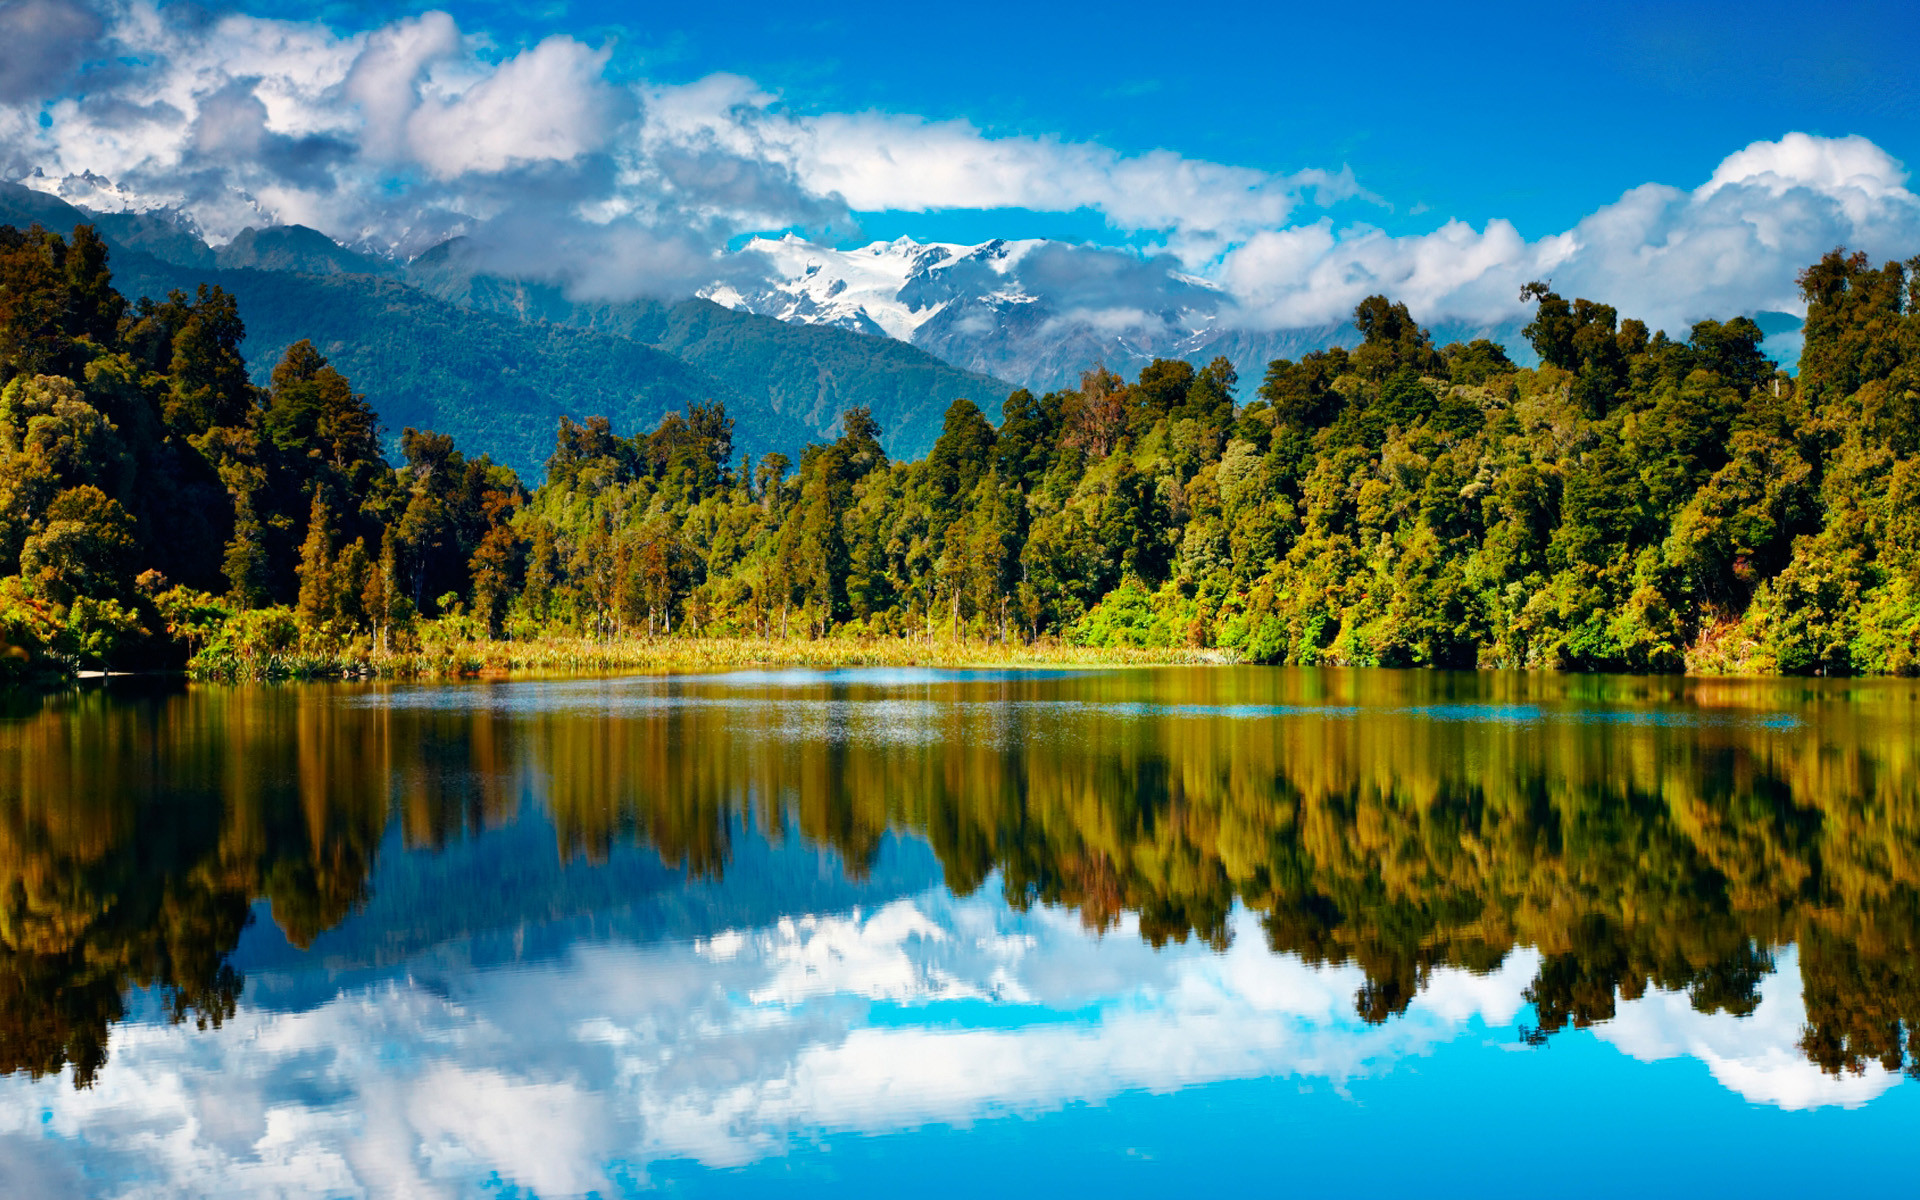 New Zealand Scenery Wallpaper